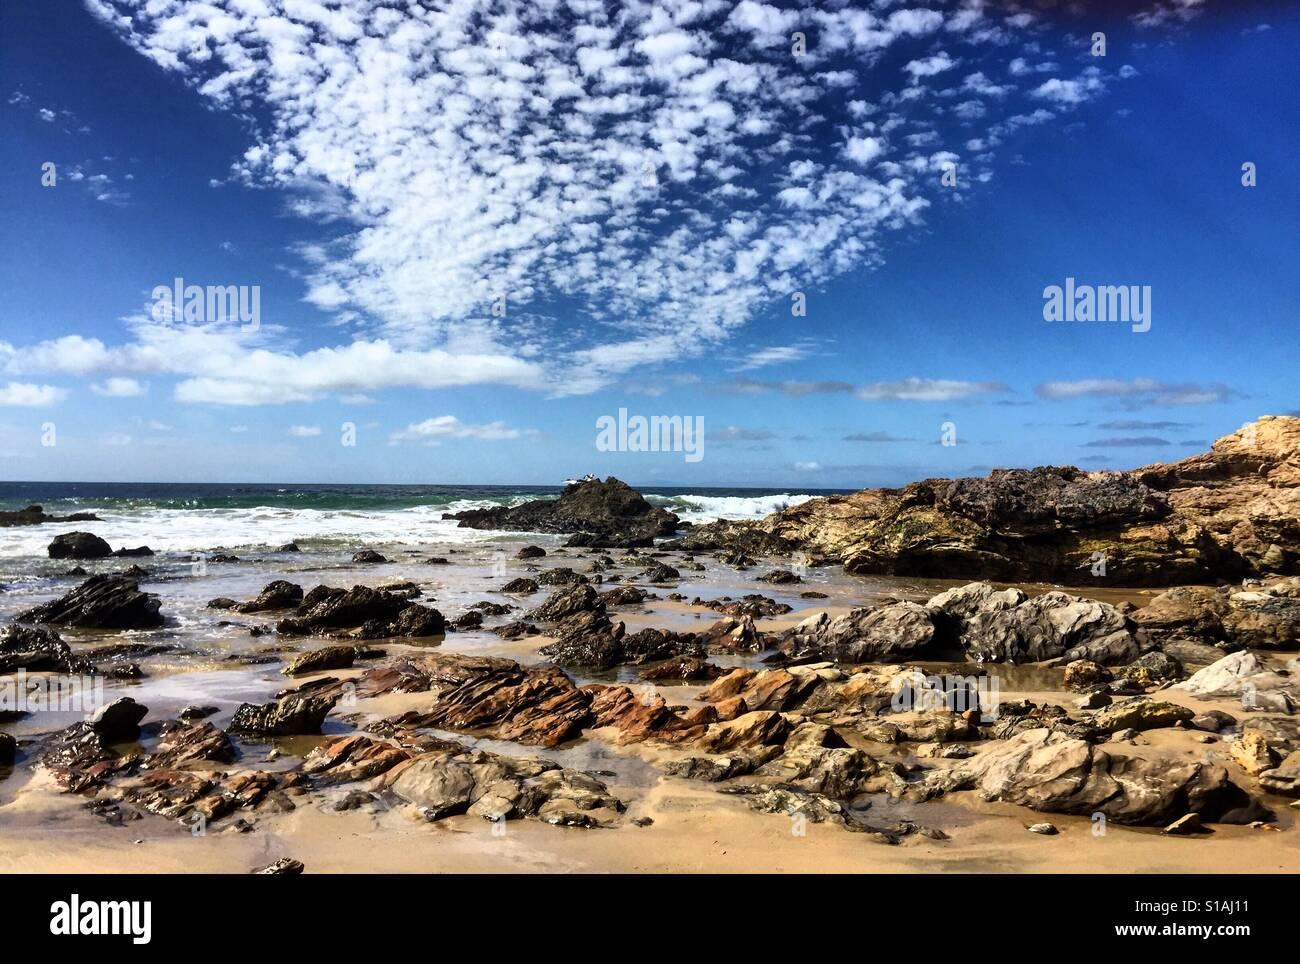 Corona Del Marr beach - Stock Image